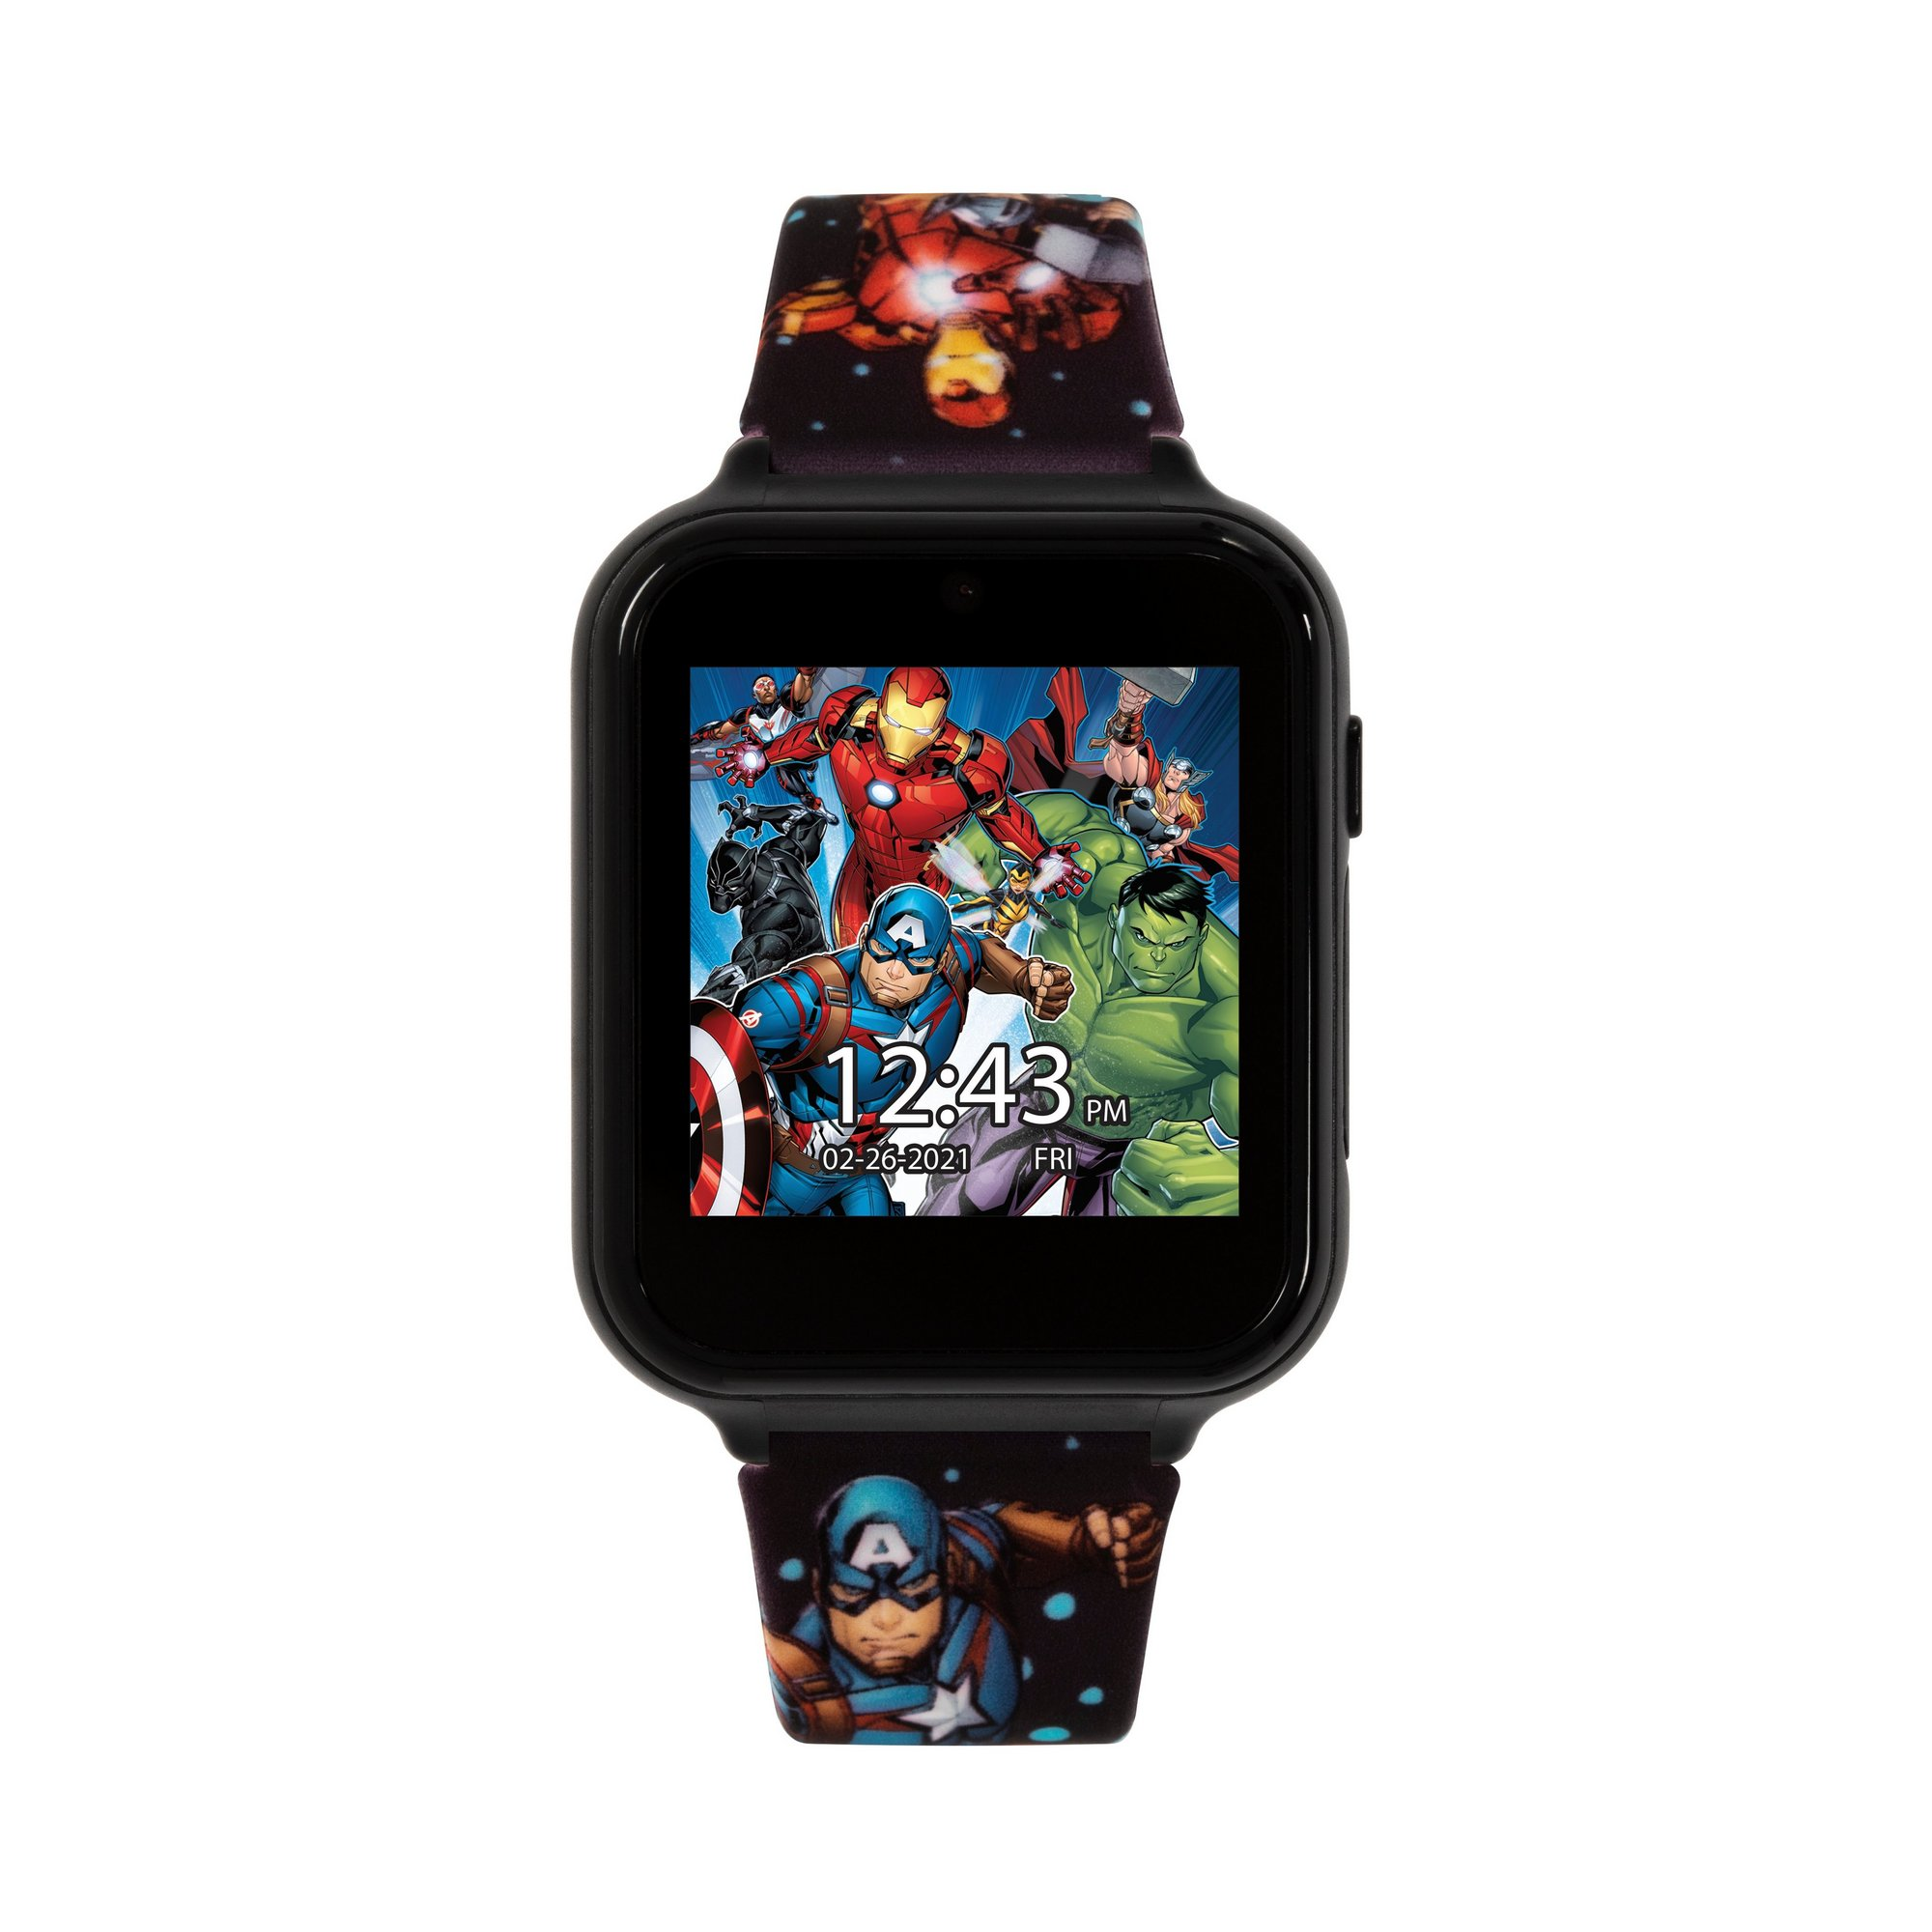 Image of Avengers Kids Smart Watch